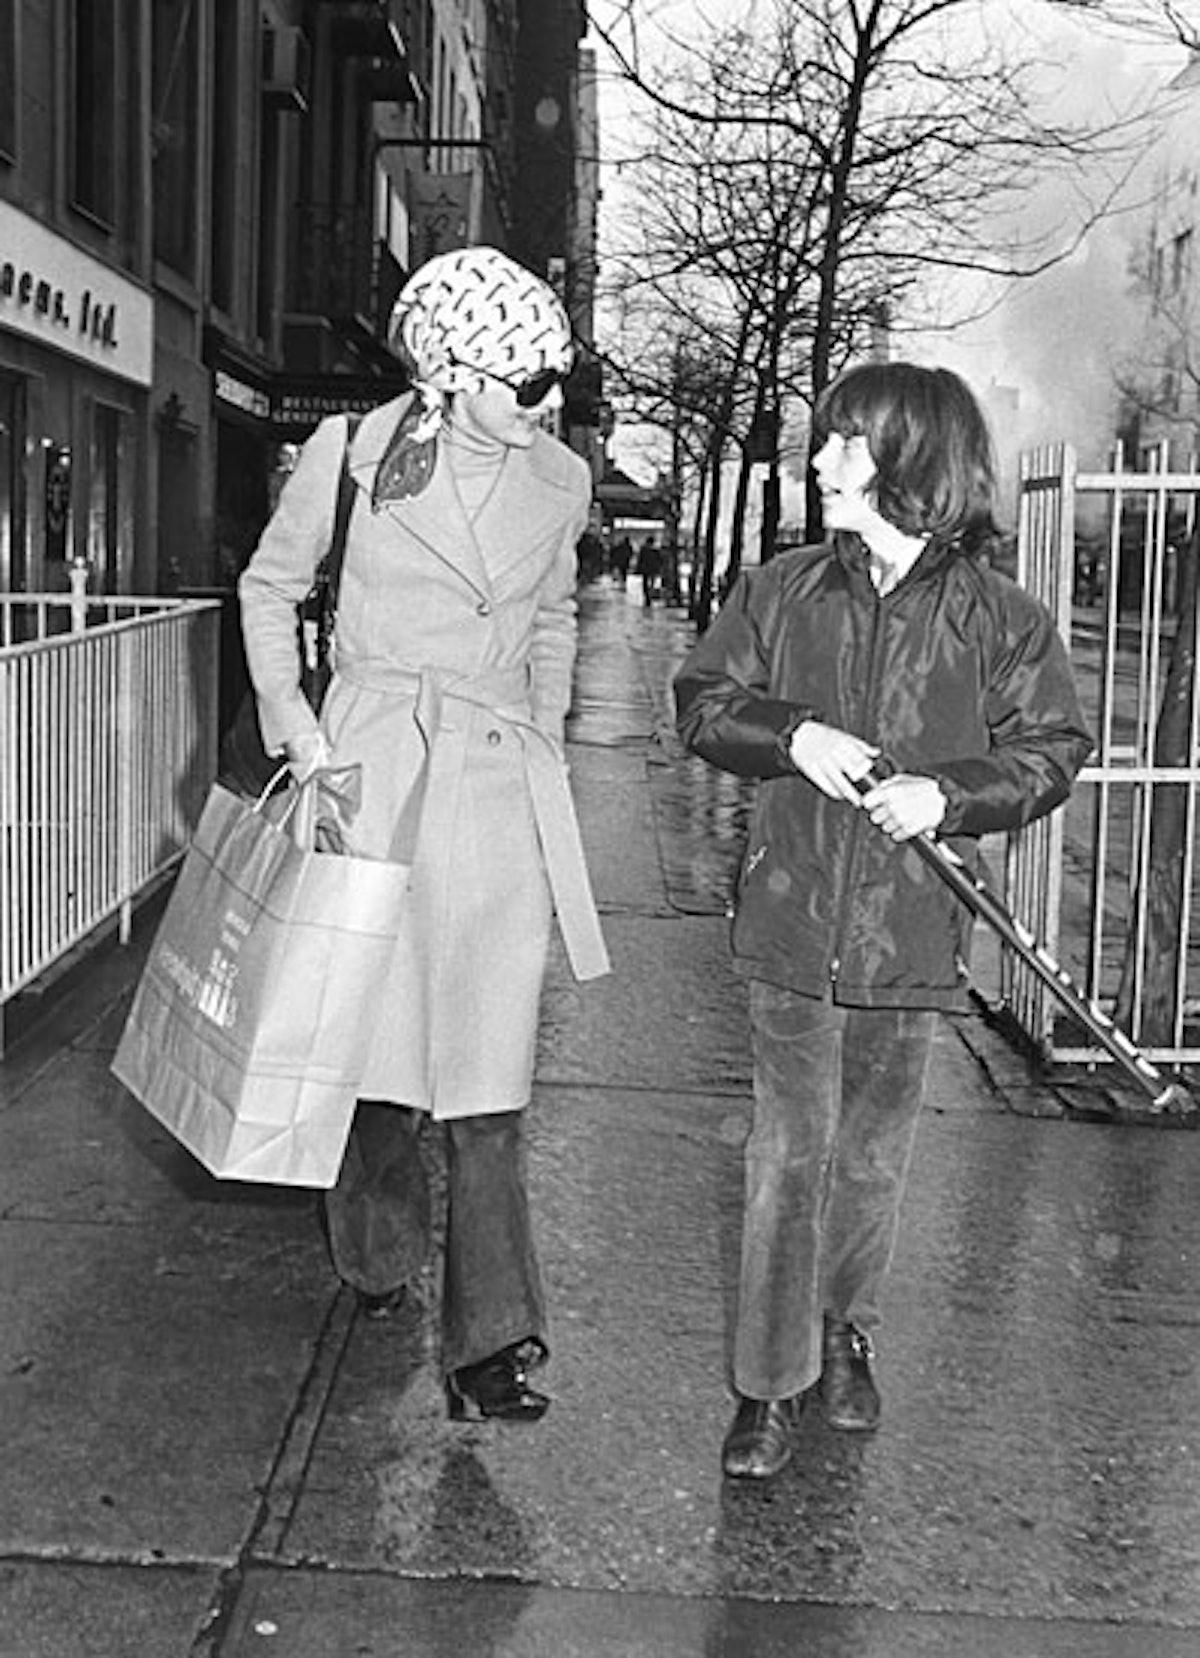 fass-w-timeline-70s-03-v.jpg